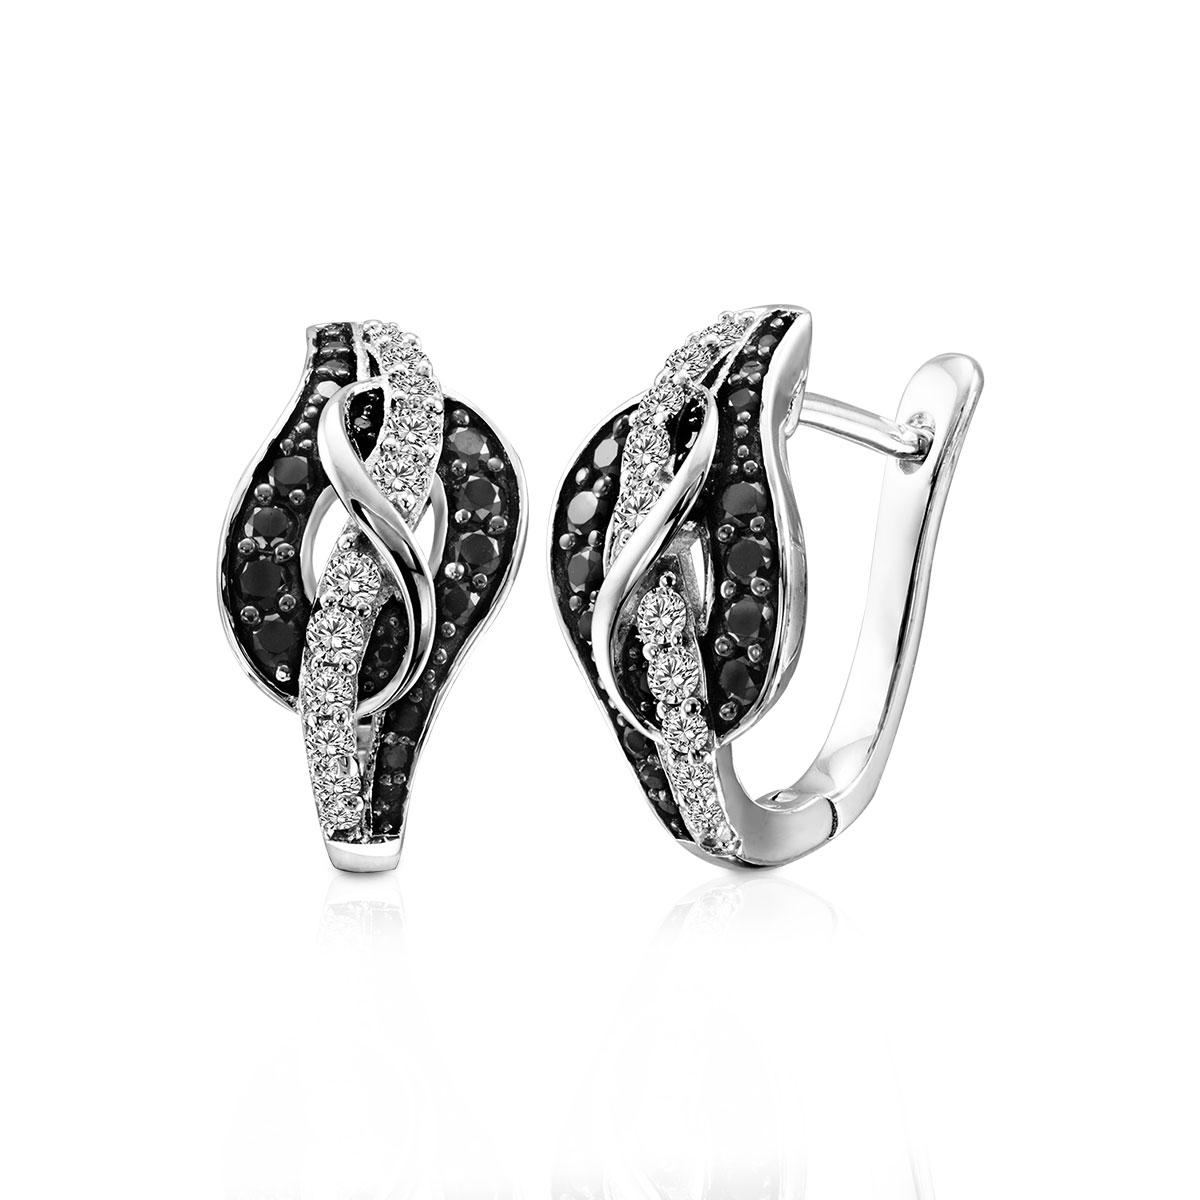 ED149 璀璨軌跡-完美曲線奢華耳環/一對販售